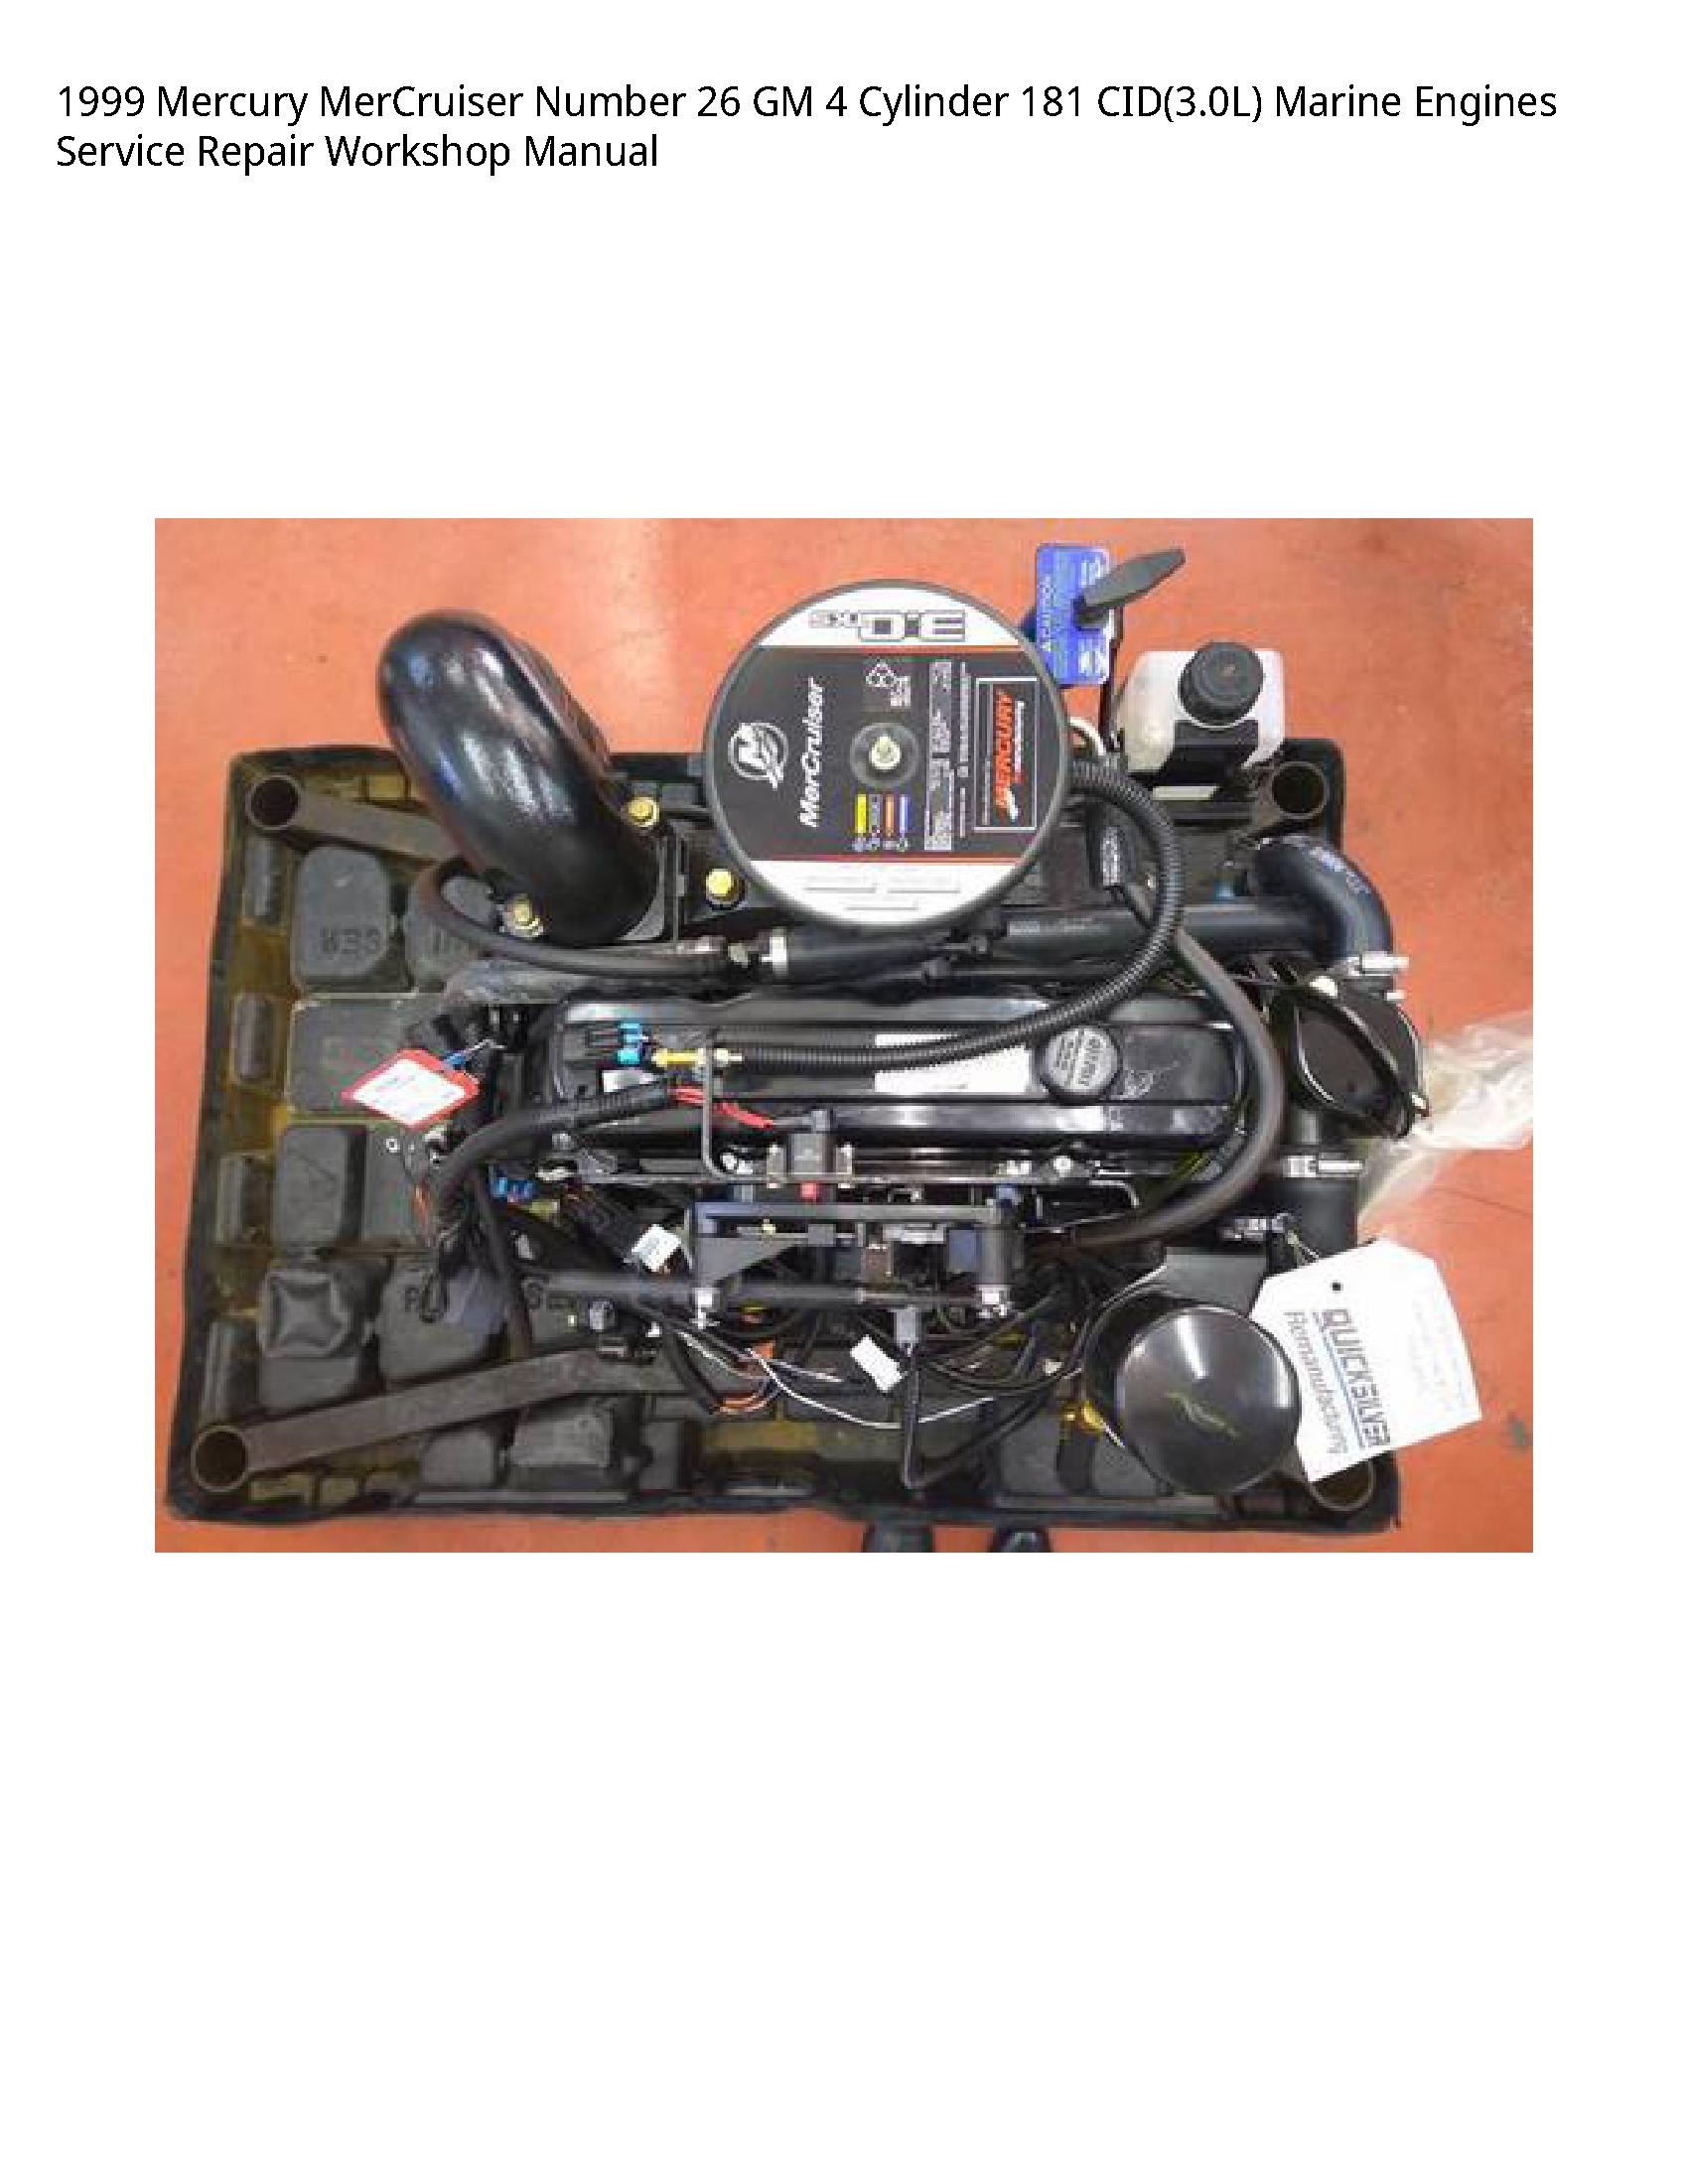 Mercury 26 MerCruiser Number GM Cylinder Marine Engines manual